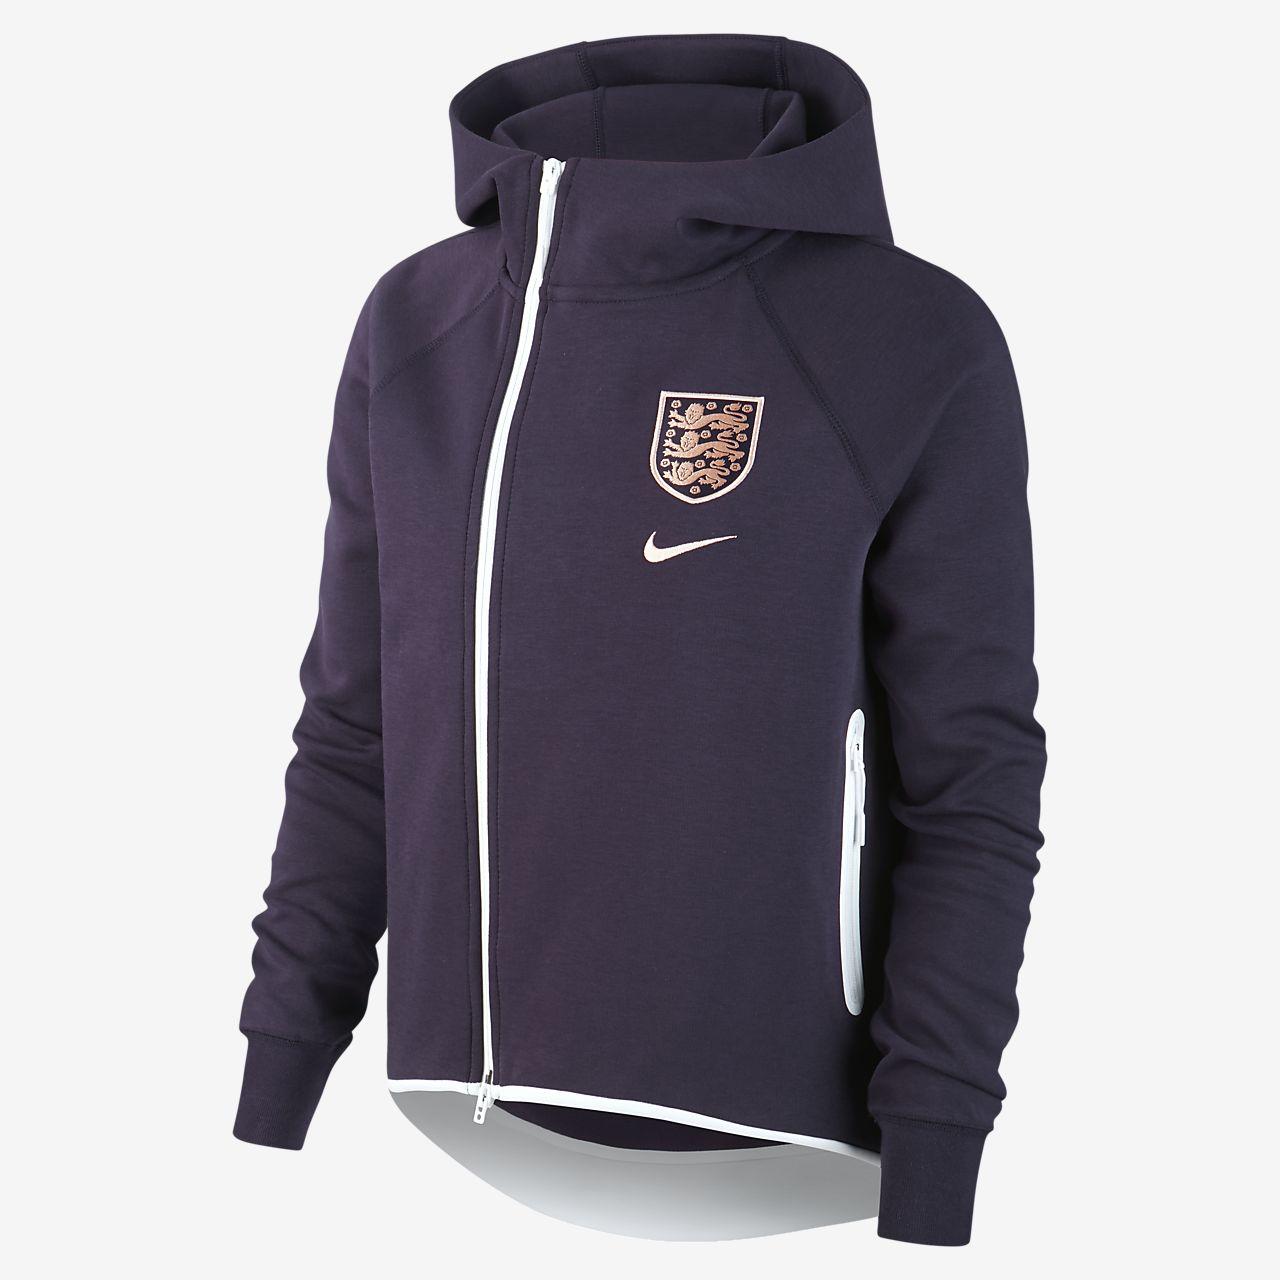 Veste style cape de football England Tech Fleece pour Femme